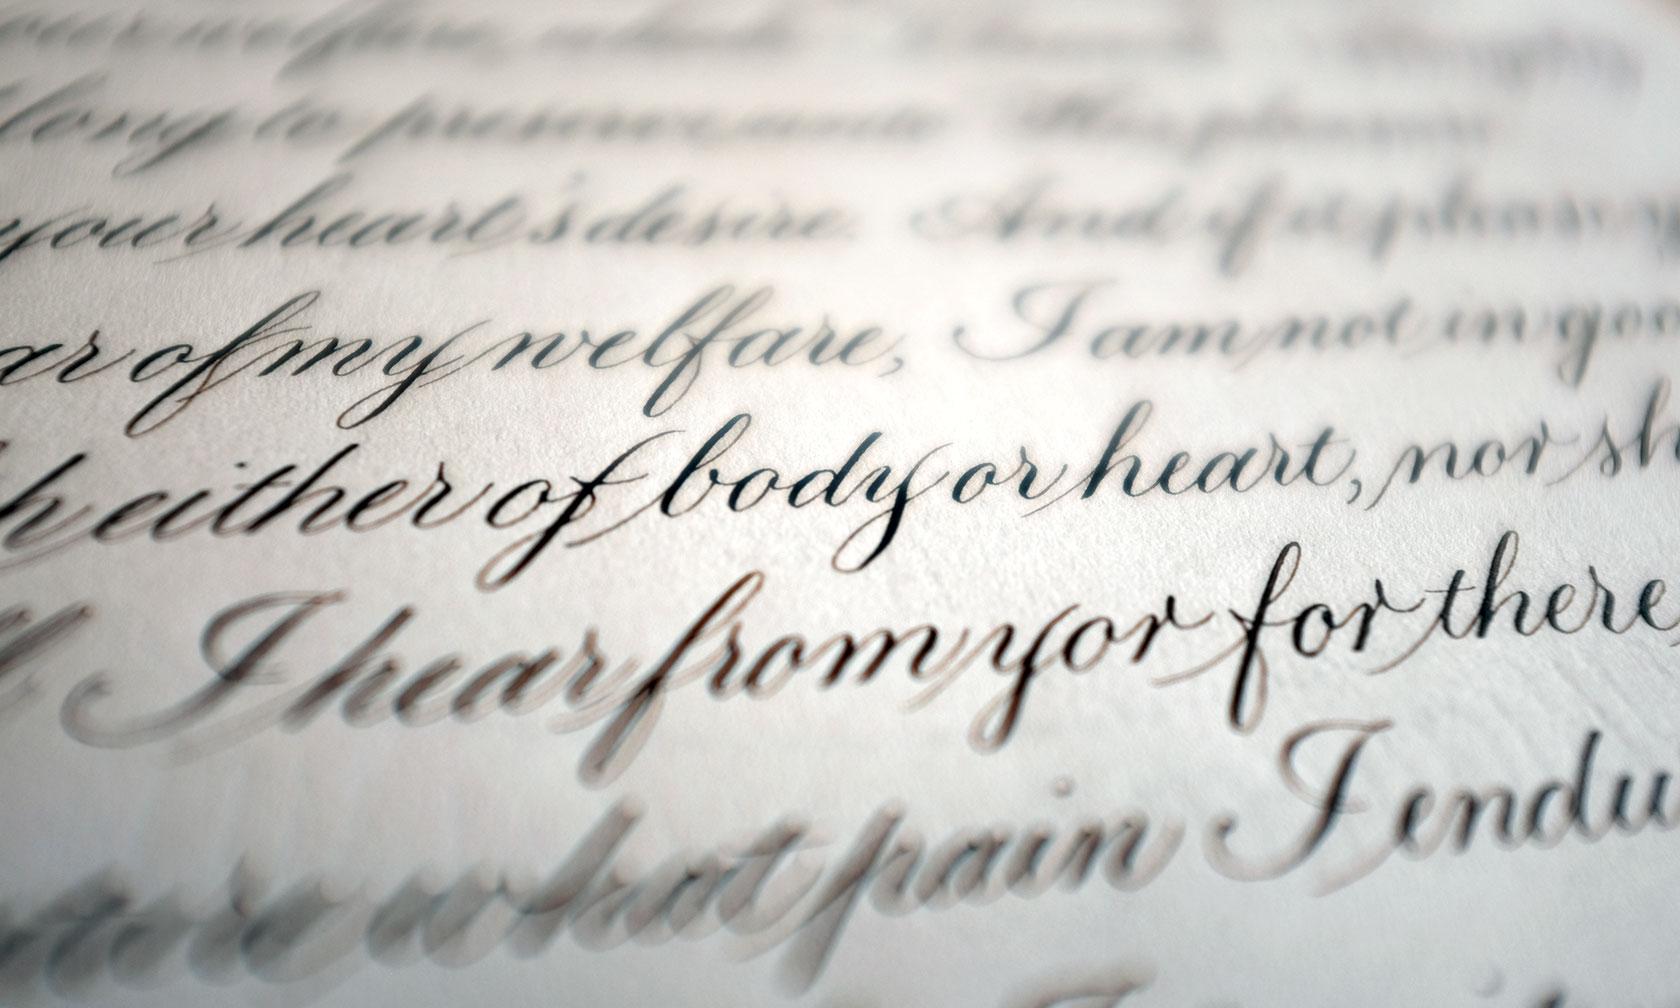 Federflug Calligraphy Script Styles